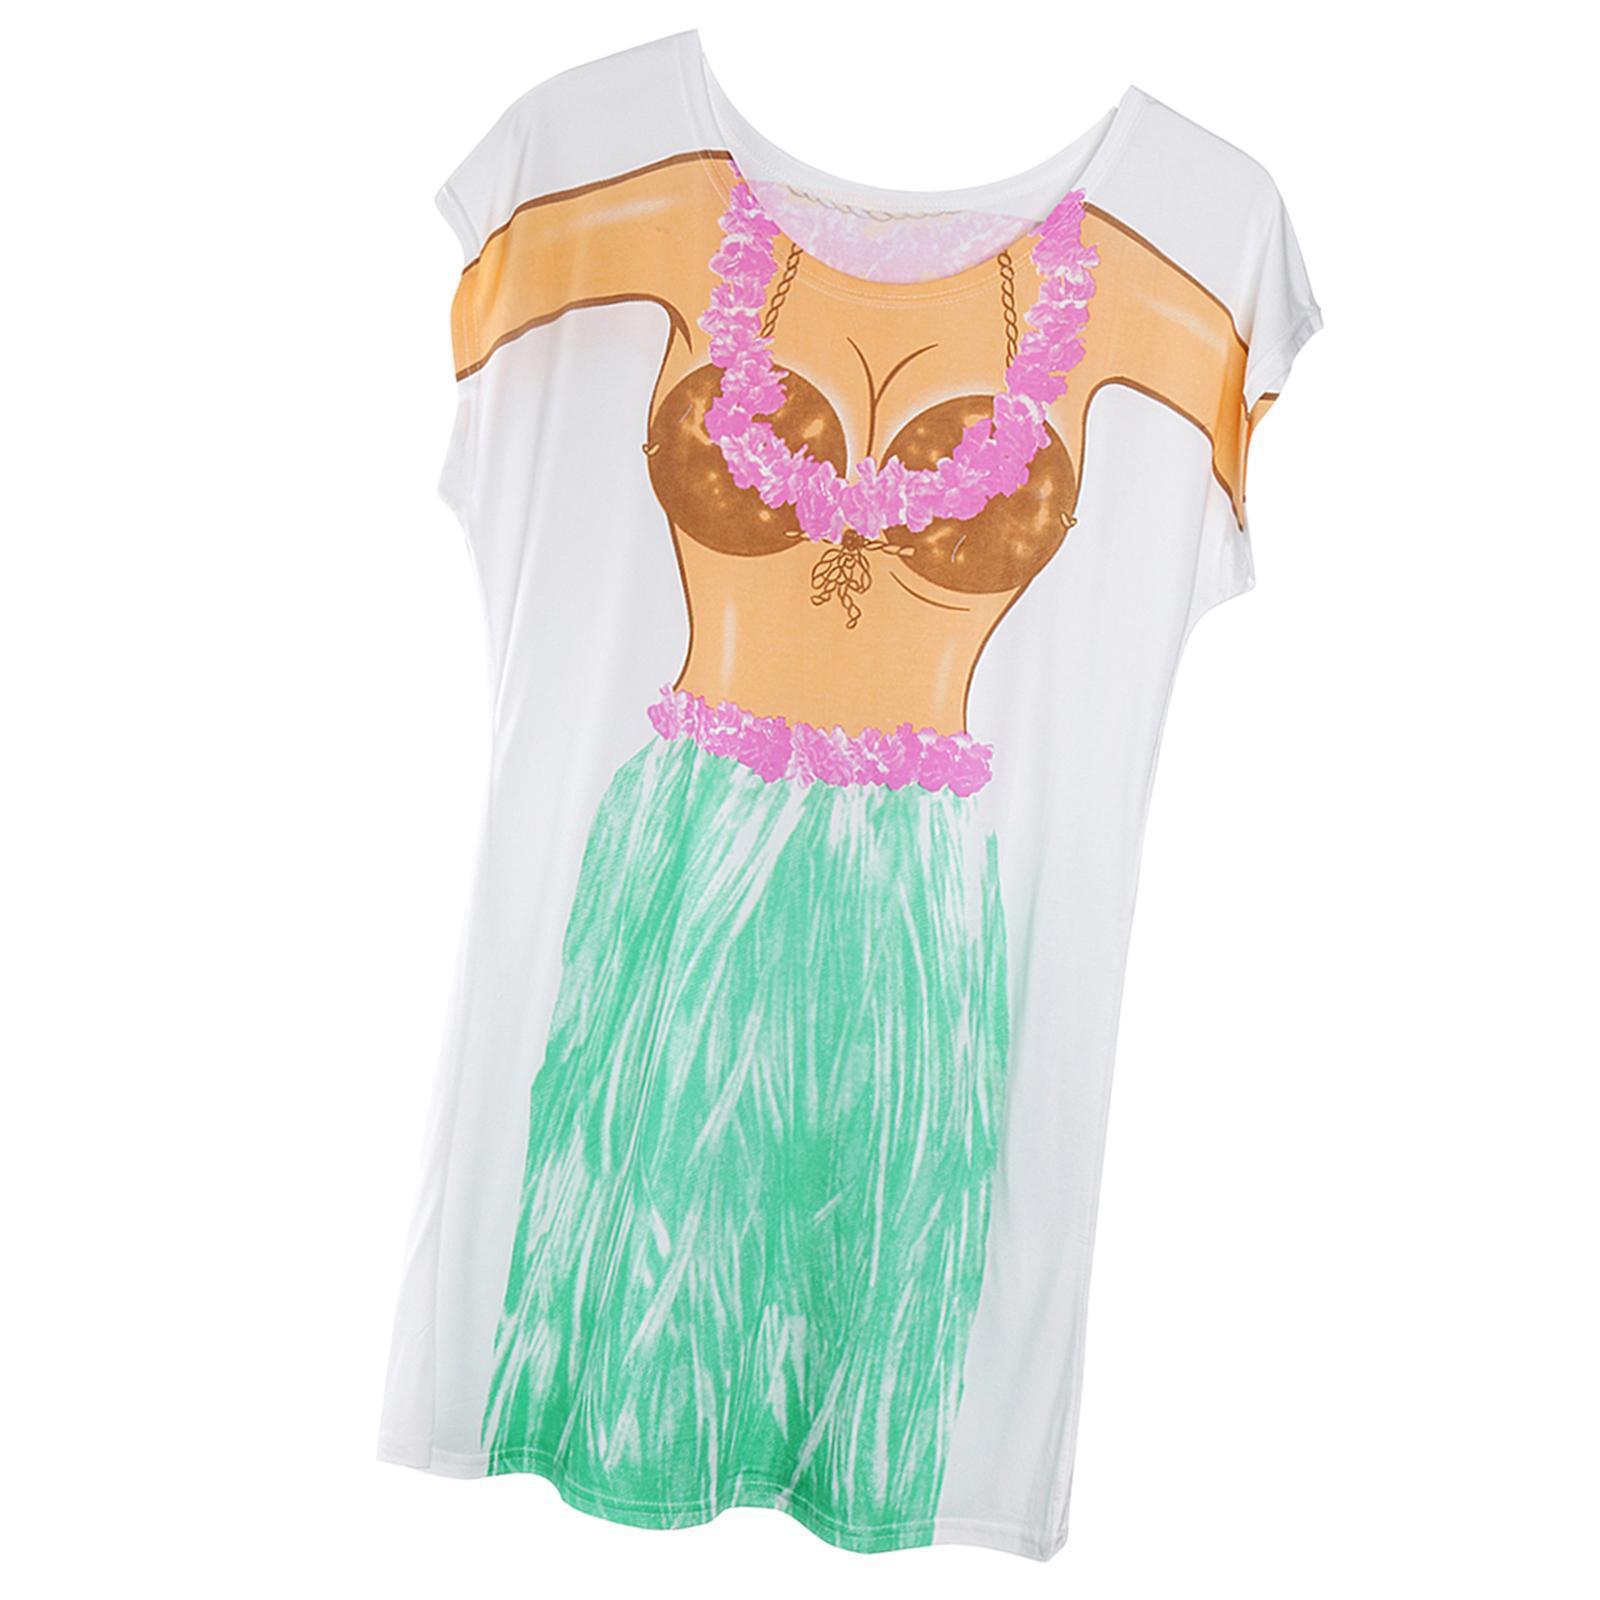 Womens-Bikini-Hawaiian-Summer-Beach-T-Shirt-Cover-Ups-Souvenir-Hen-Night-Pajamas thumbnail 59